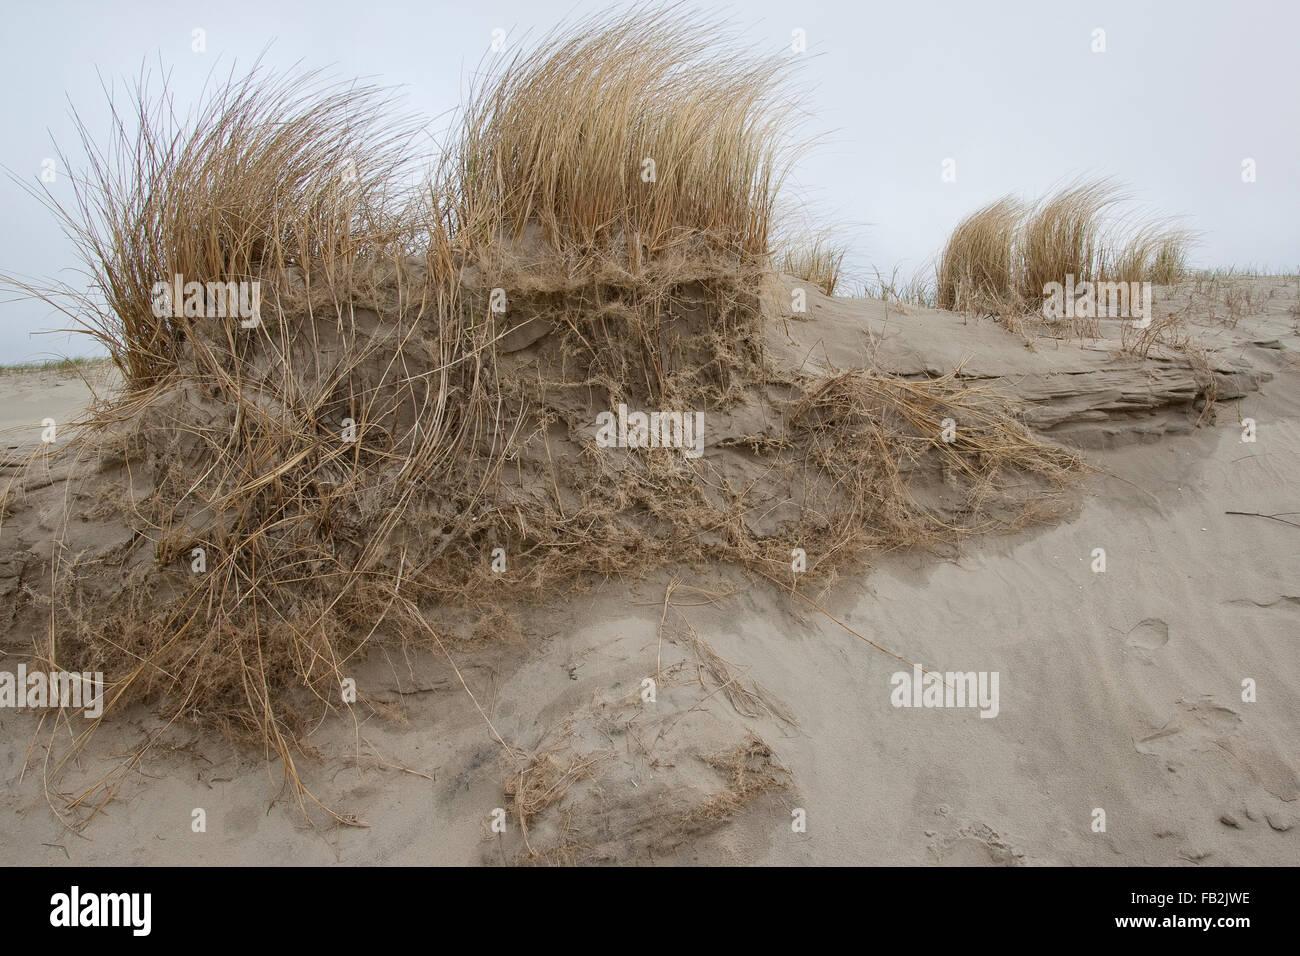 Beach Grass, Marram Grass, roots, coast protection, Strand-Hafer, Strandhafer, Wurzeln, Dünenschutz, Ammophila arenaria Stock Photo